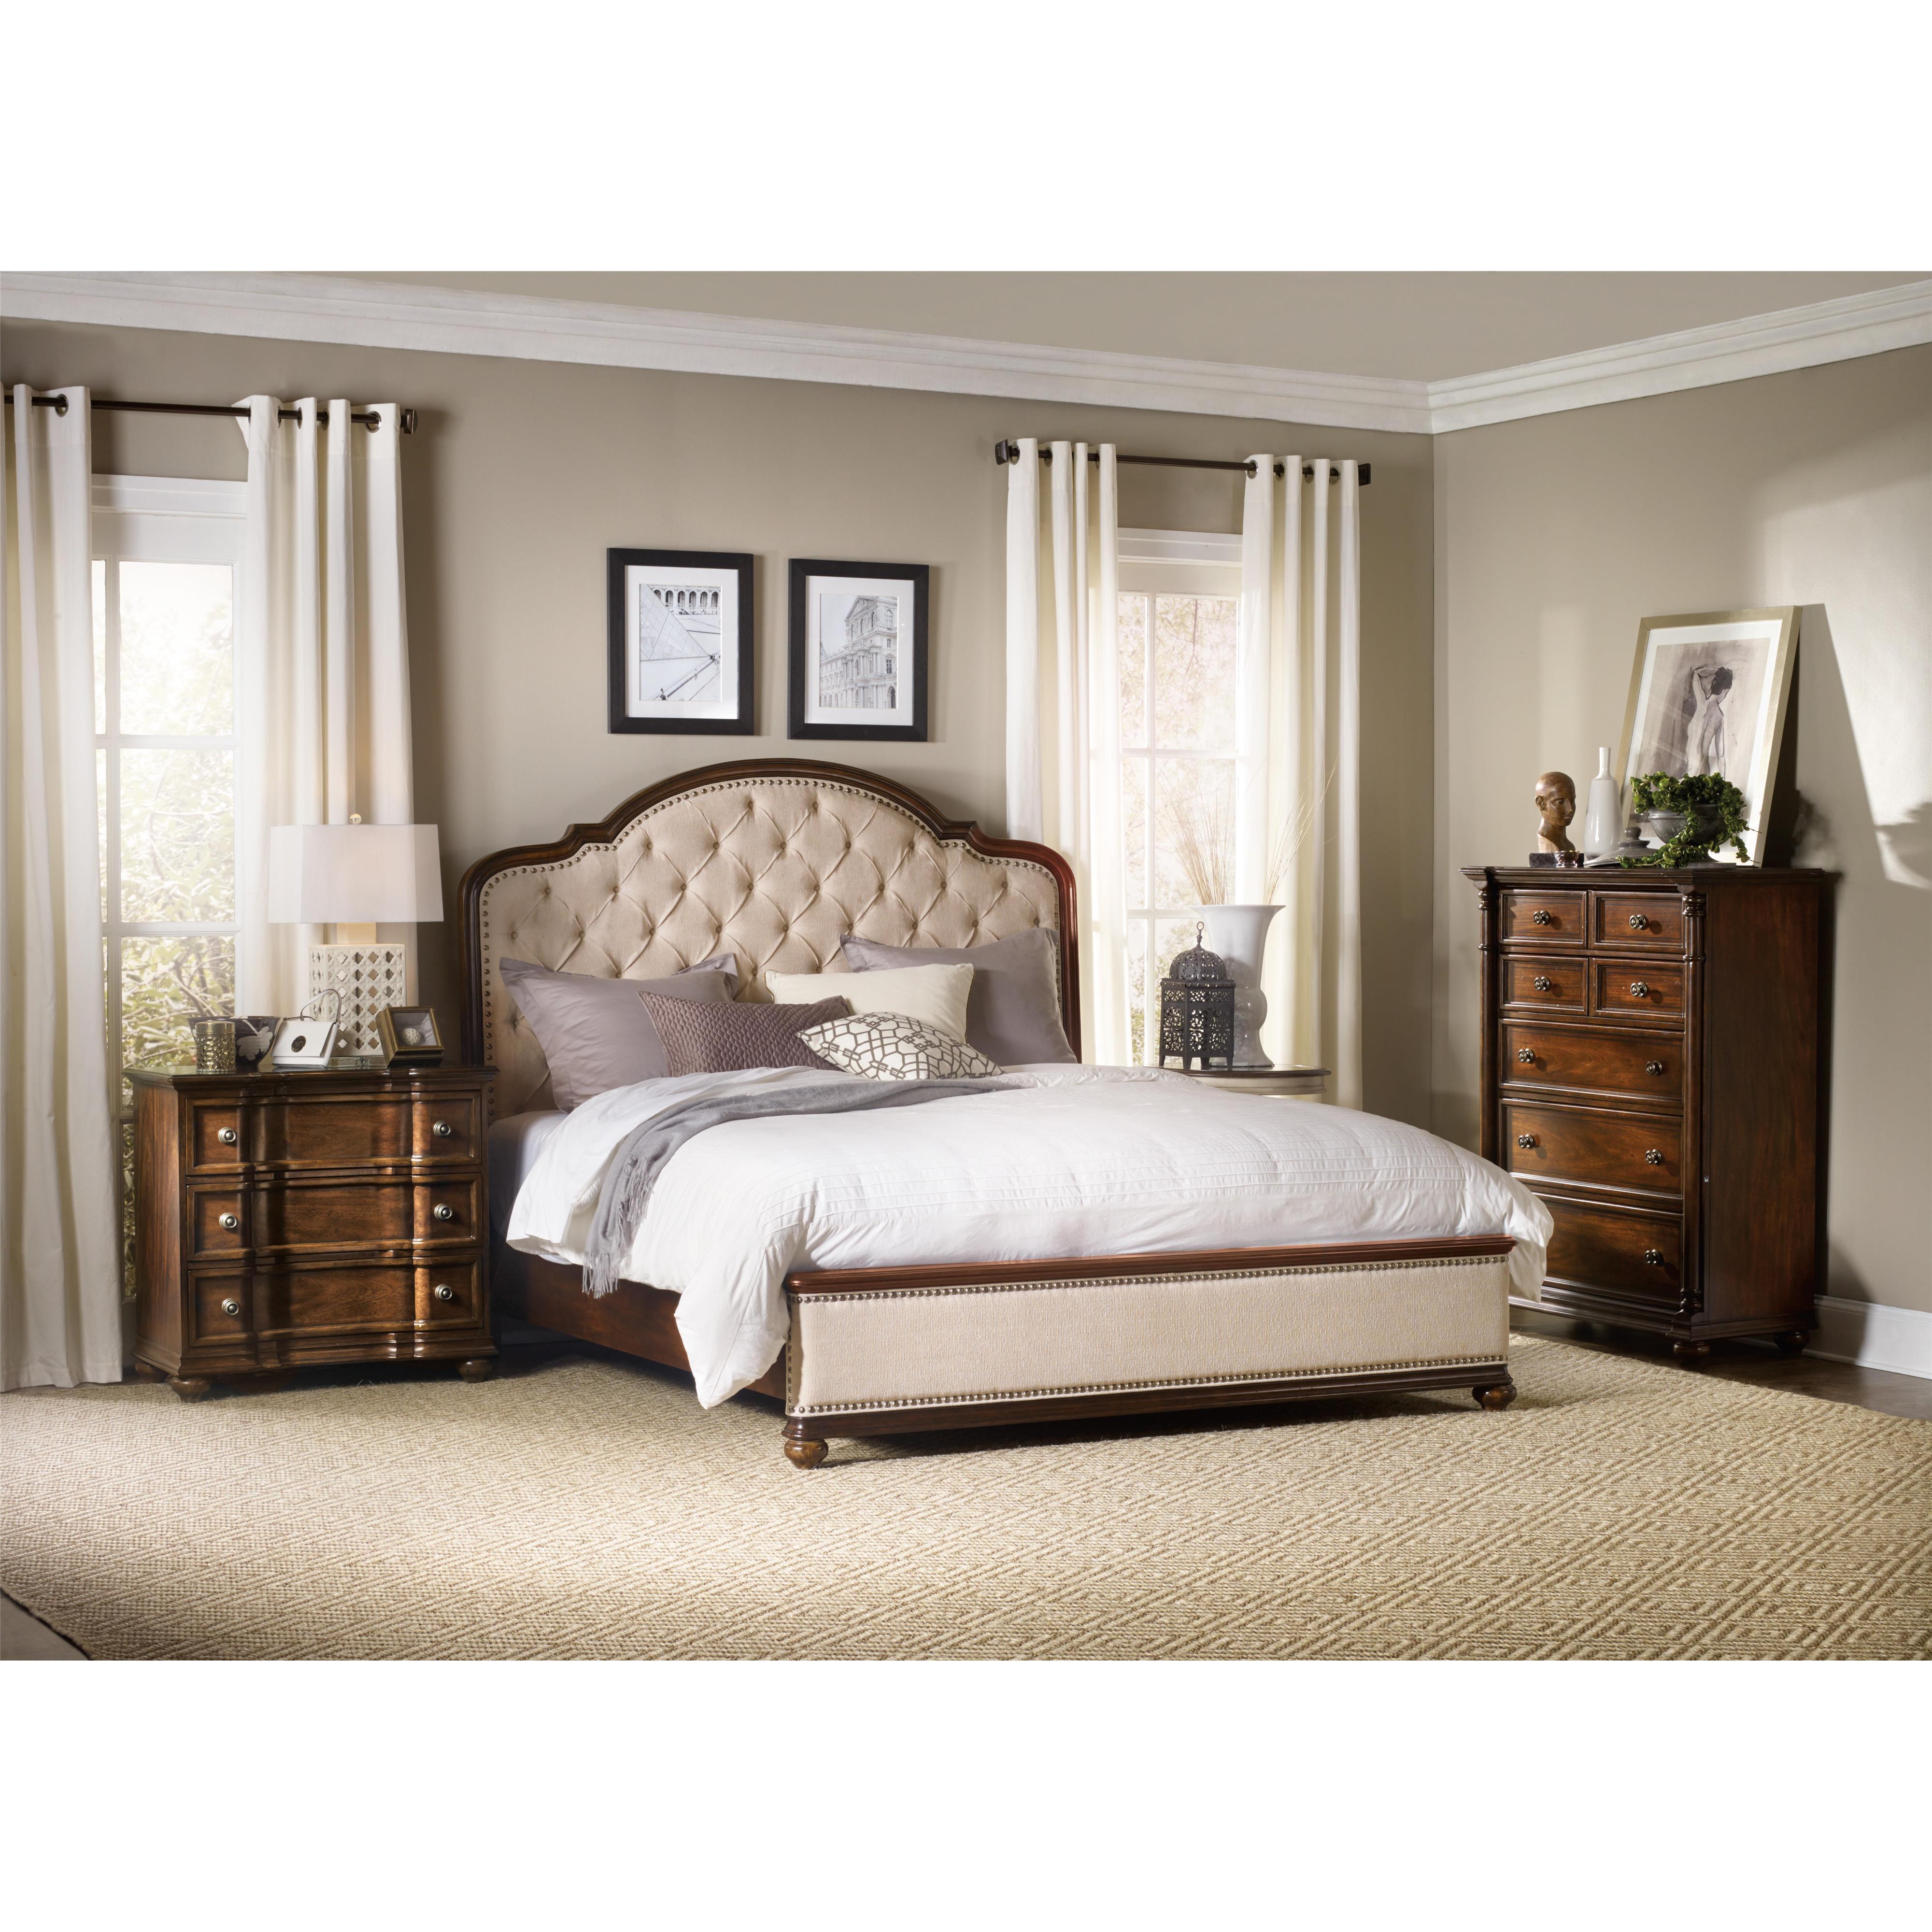 Charmant California King Bedroom Group